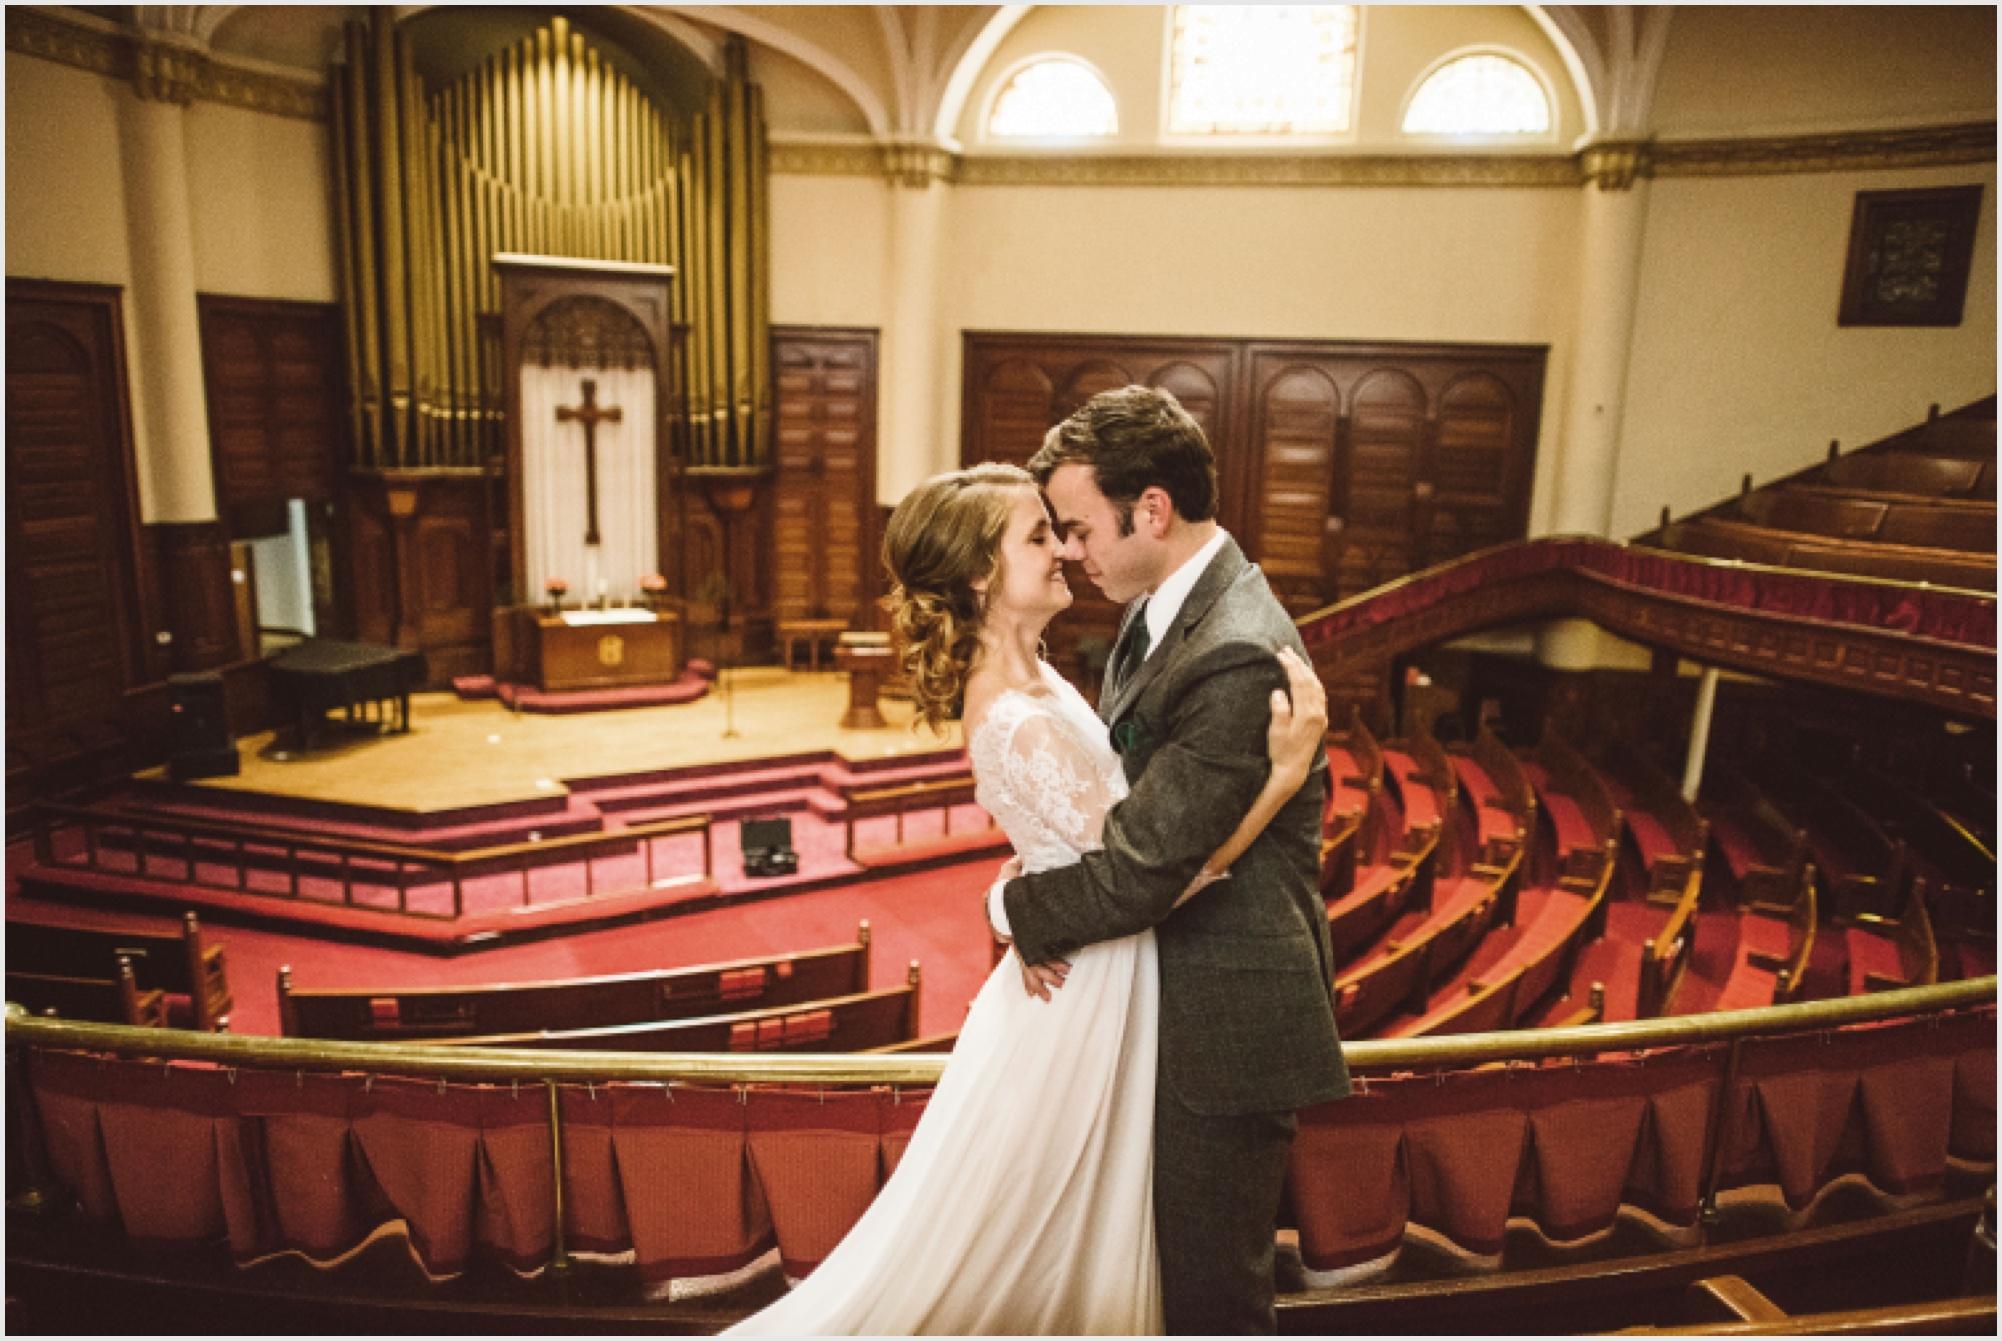 abby_taylor_minneapolis_wedding_lucas_botz_photography_134.jpg